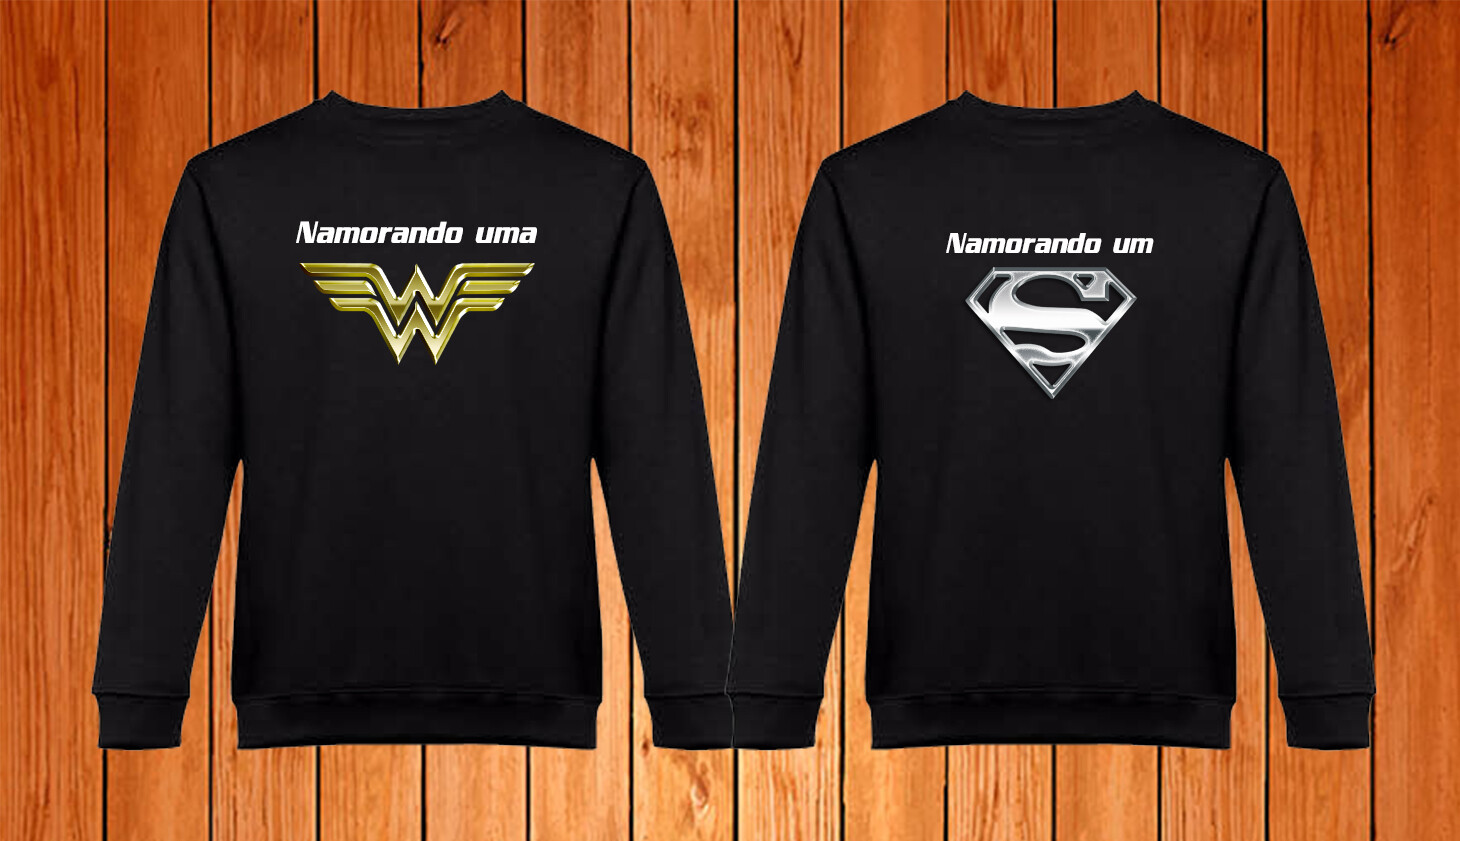 Conjunto 2 Sweatshirts Namorando um(a)...